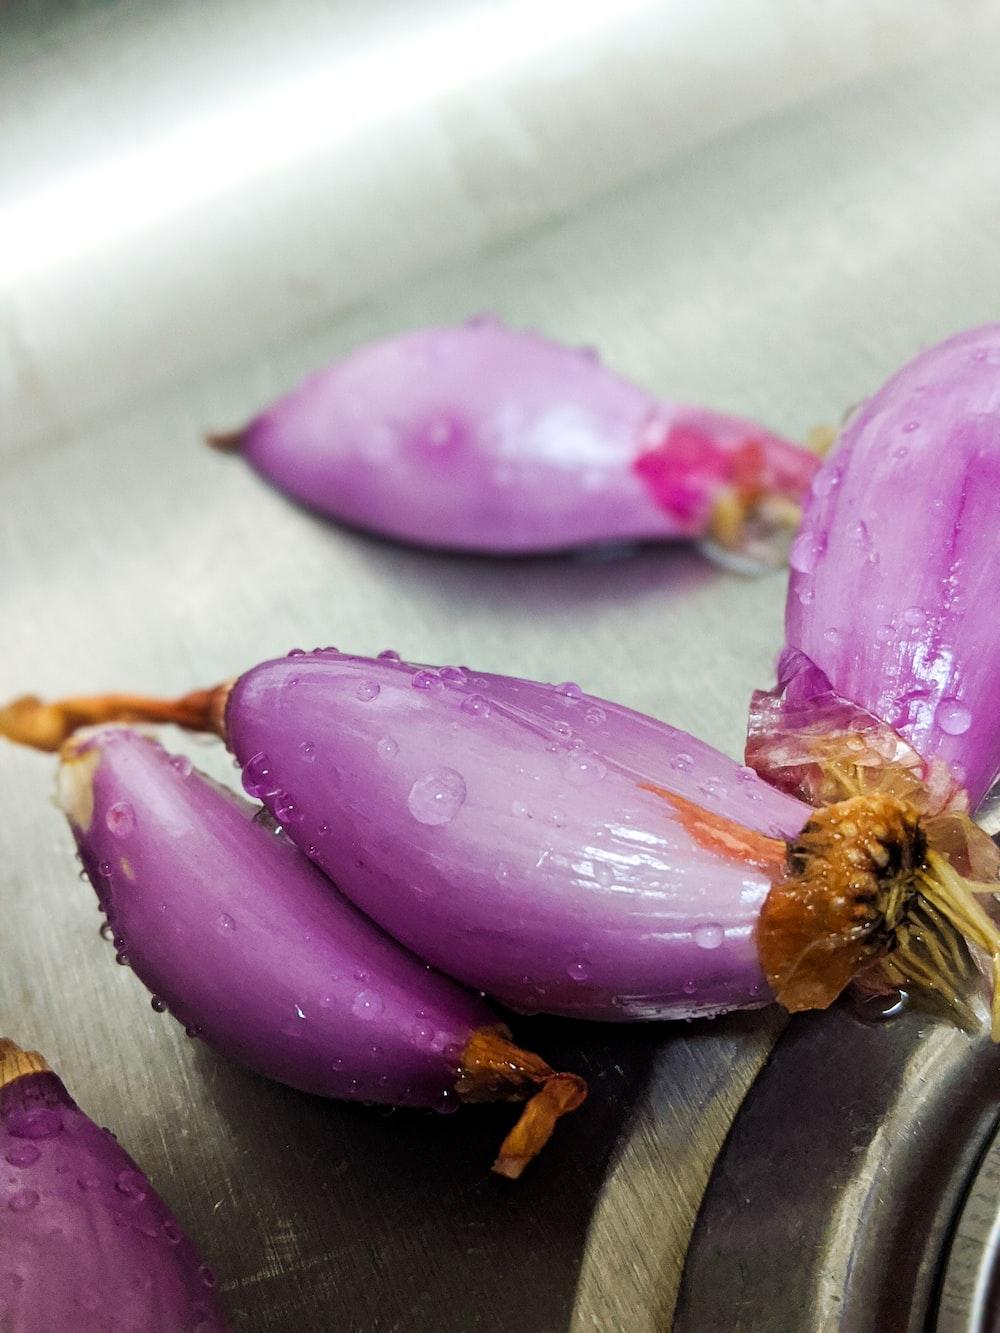 purple flower petals on brown wooden table